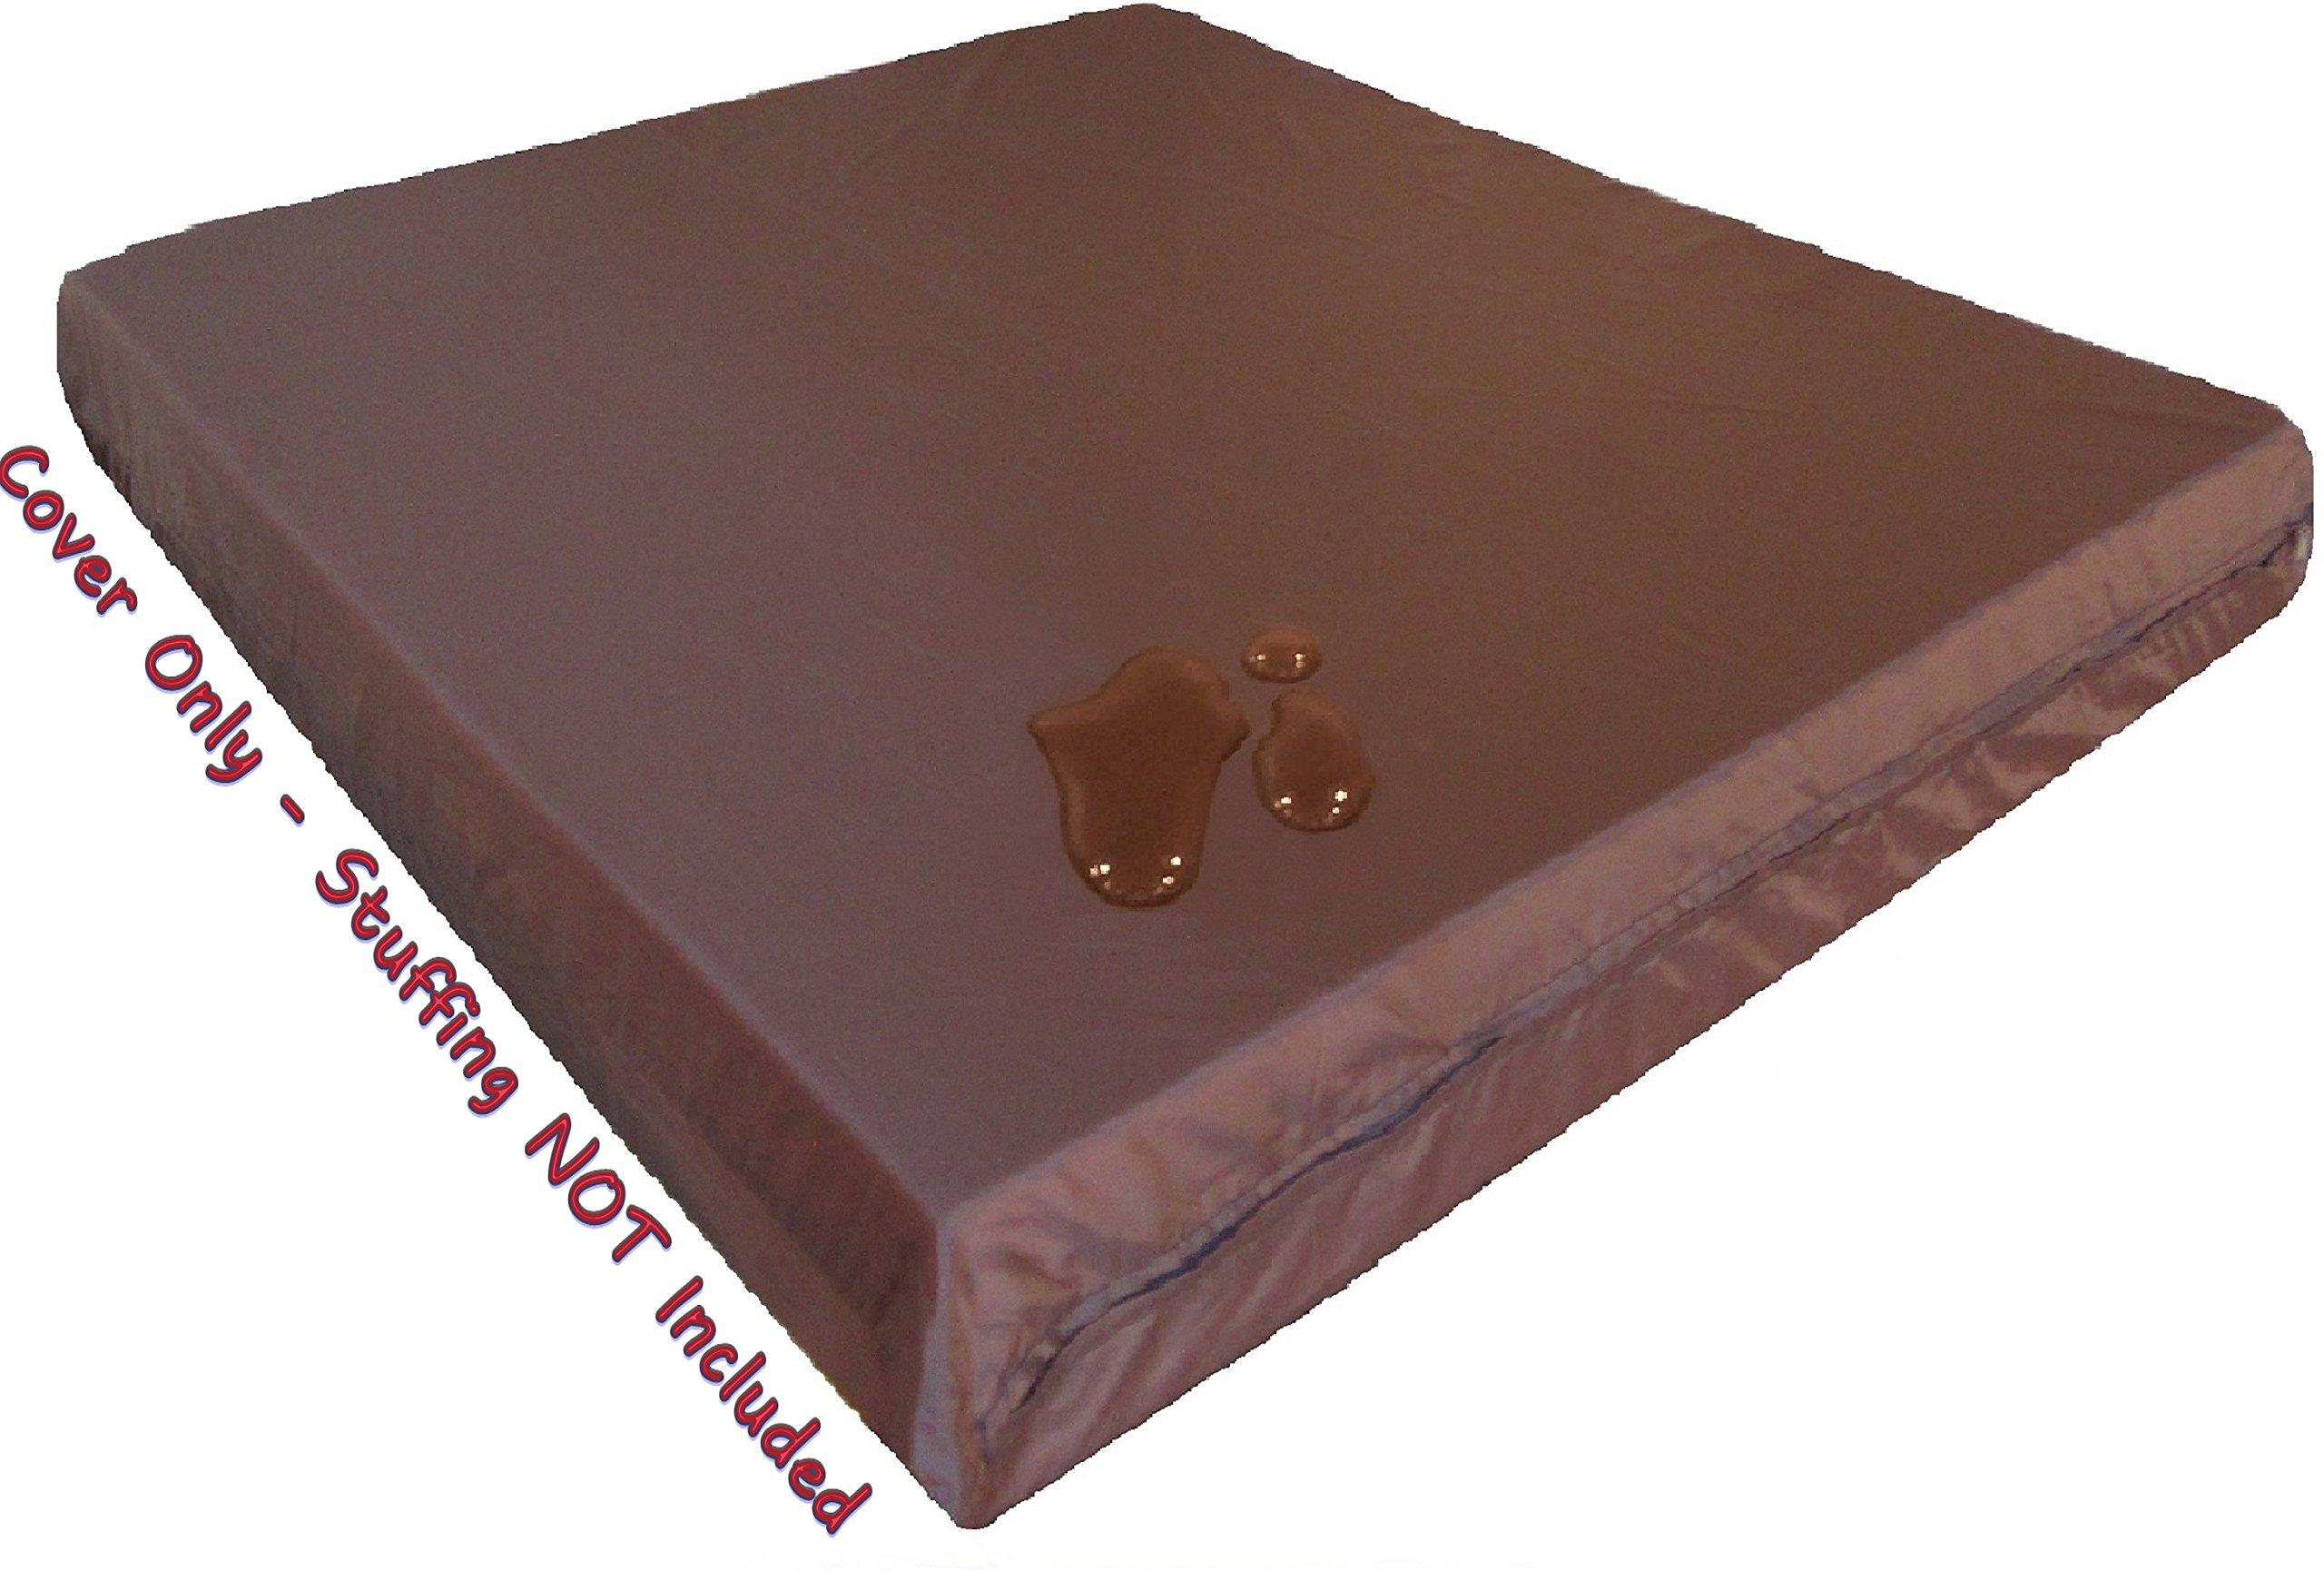 "Dogbed4less 1 Pack Internal Duvet Case Waterproof Zipper Dog Bed Cover for Jumbo/XXXL Large 55""x47""X4"" Memory Foam Pad Pet Bed - 59""x51"" FLAT"